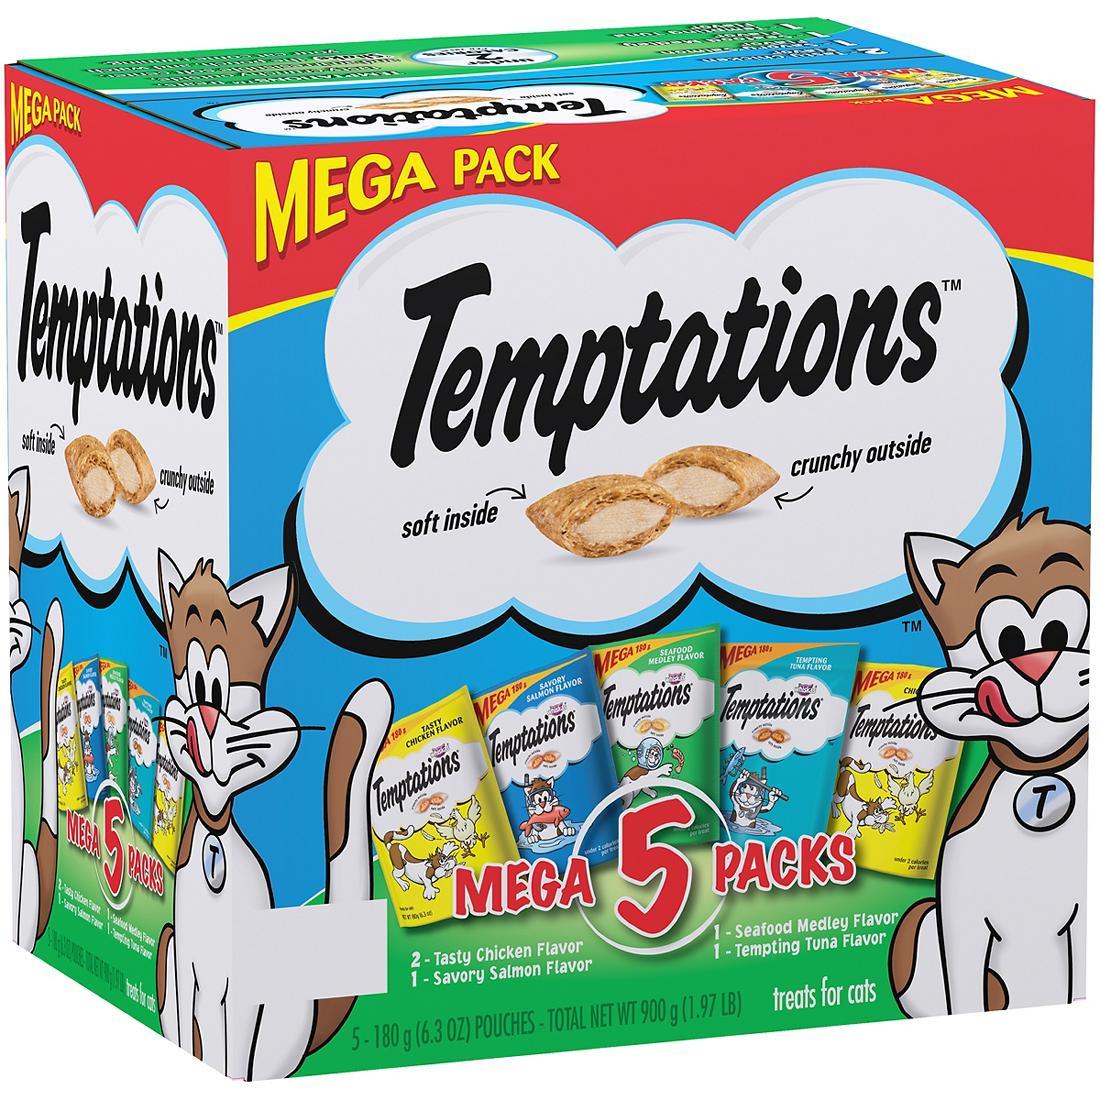 6 lb 9 oz clipart banner royalty free Whiskas Temptations Cat Treats Mega Pack, 5 ct./6.3 oz. banner royalty free